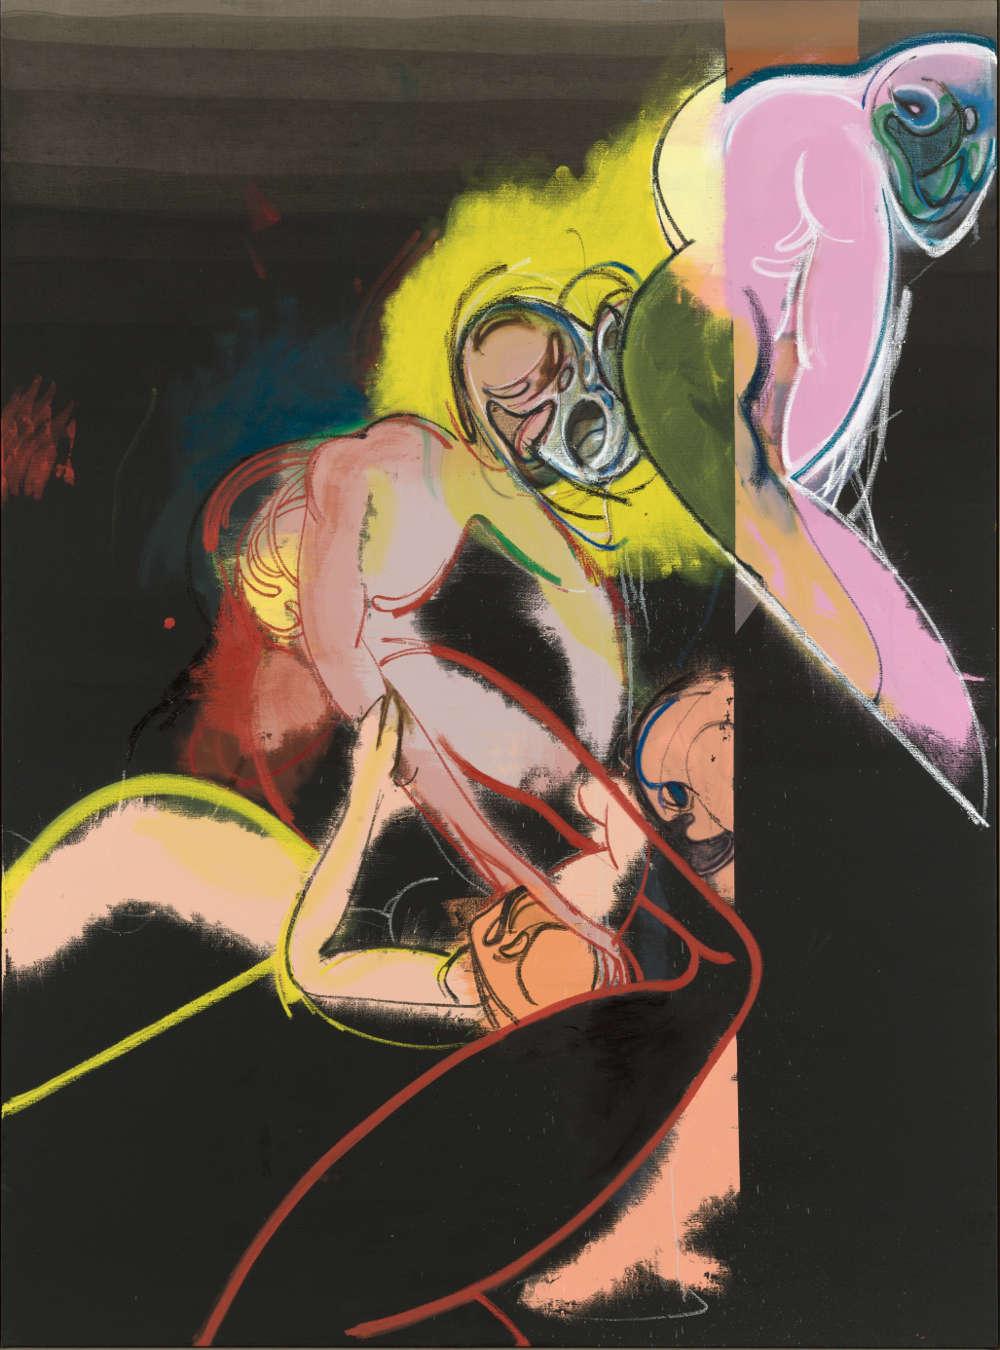 Daniel Richter, They thenmen took over then, 2018. Oil on canvas 230 x 170 cm (90,55 x 66,93 in) Courtesy Galerie Thaddaeus Ropac, London · Paris · Salzburg © Daniel Richter/DACS, London 2018. Photo: Jochen Littkemann